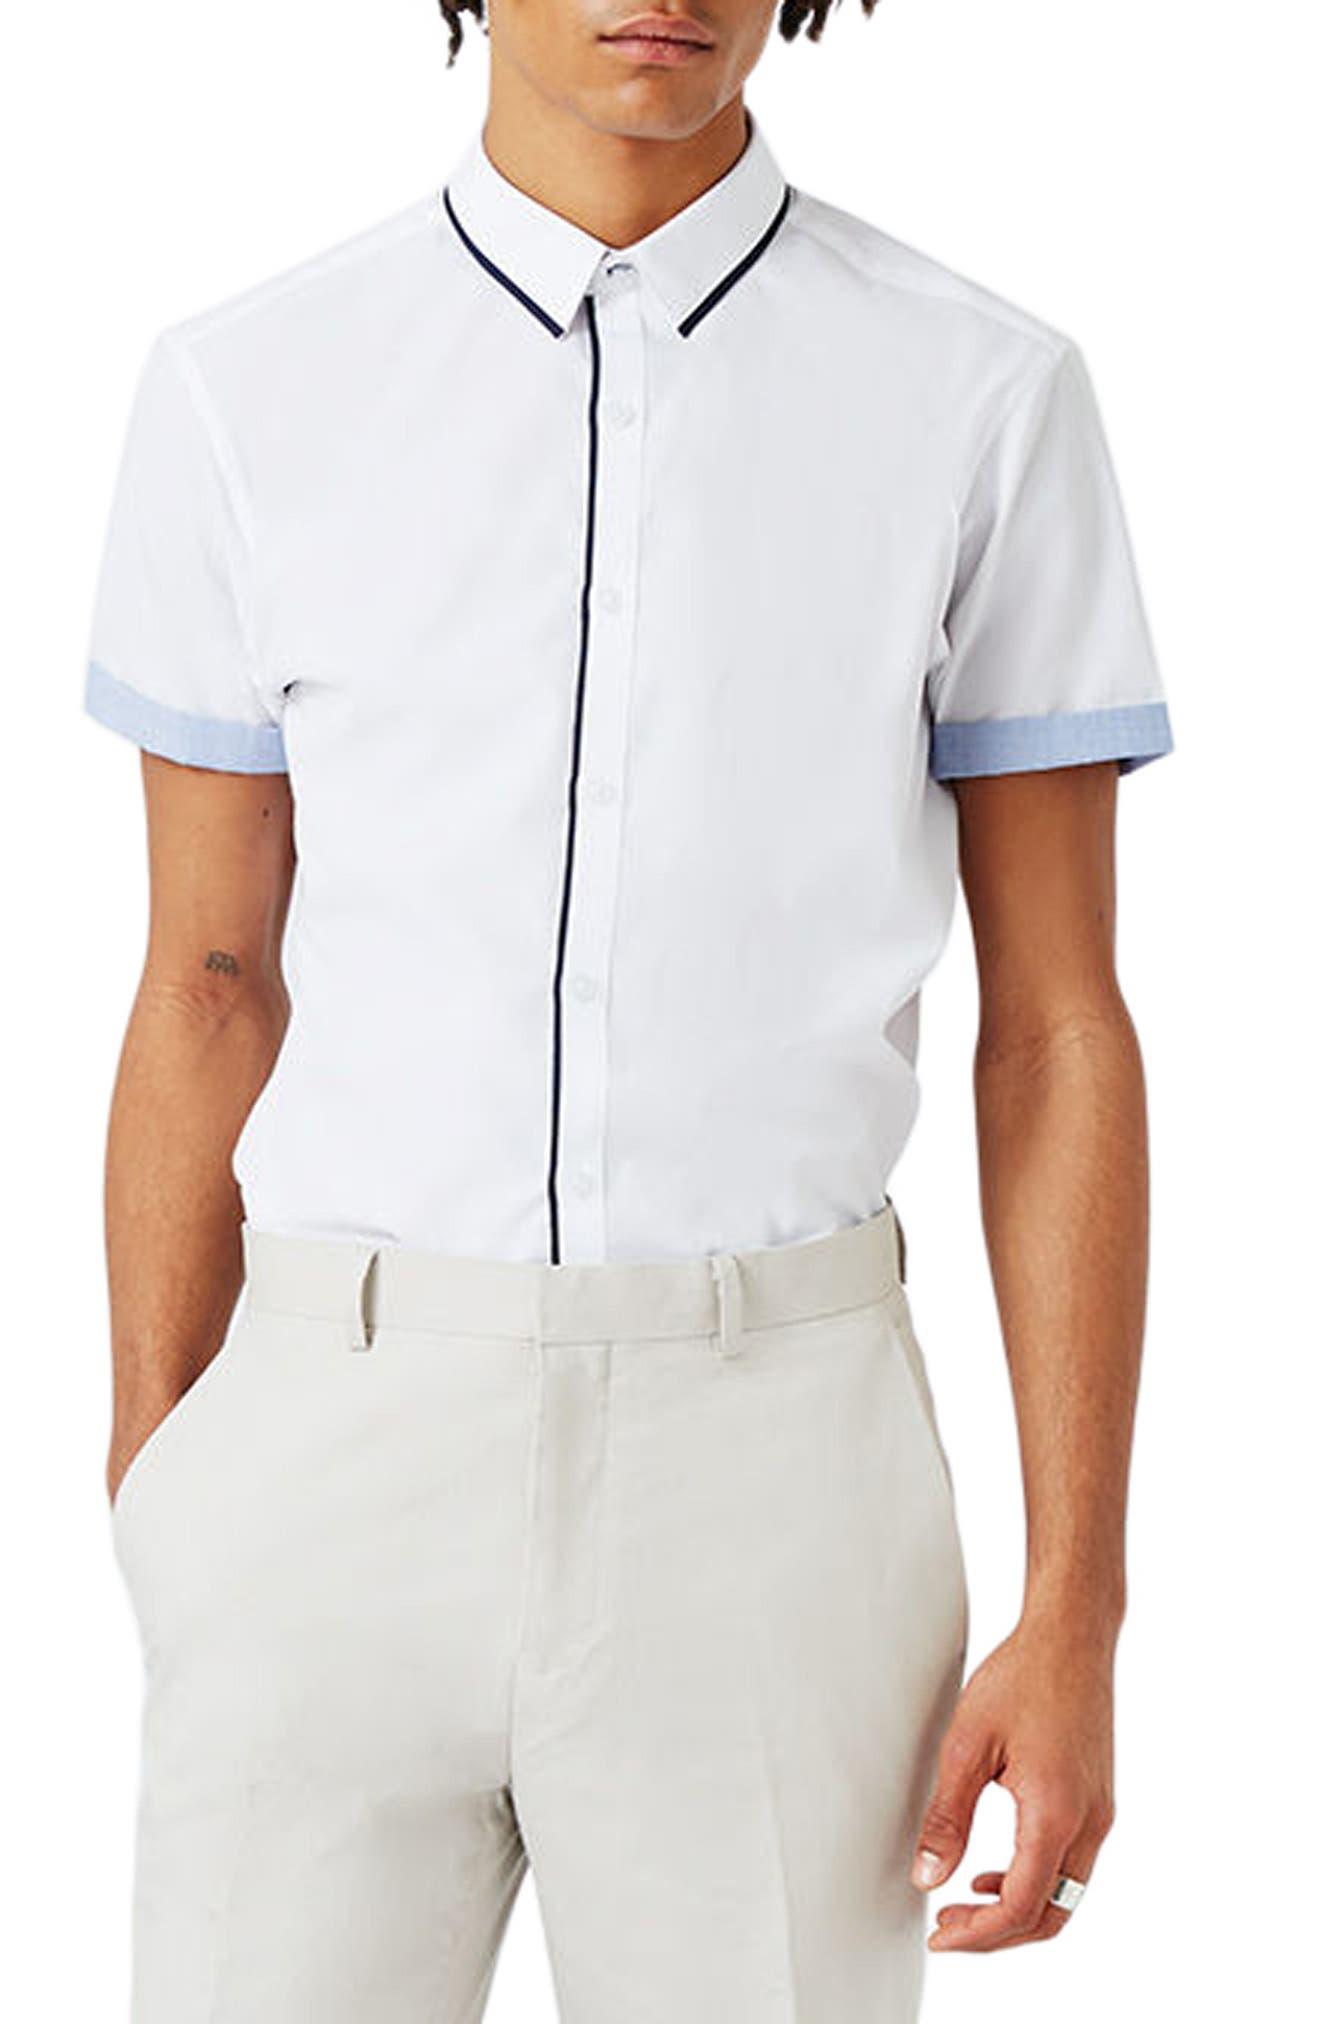 TOPMAN Contrast Trim Shirt